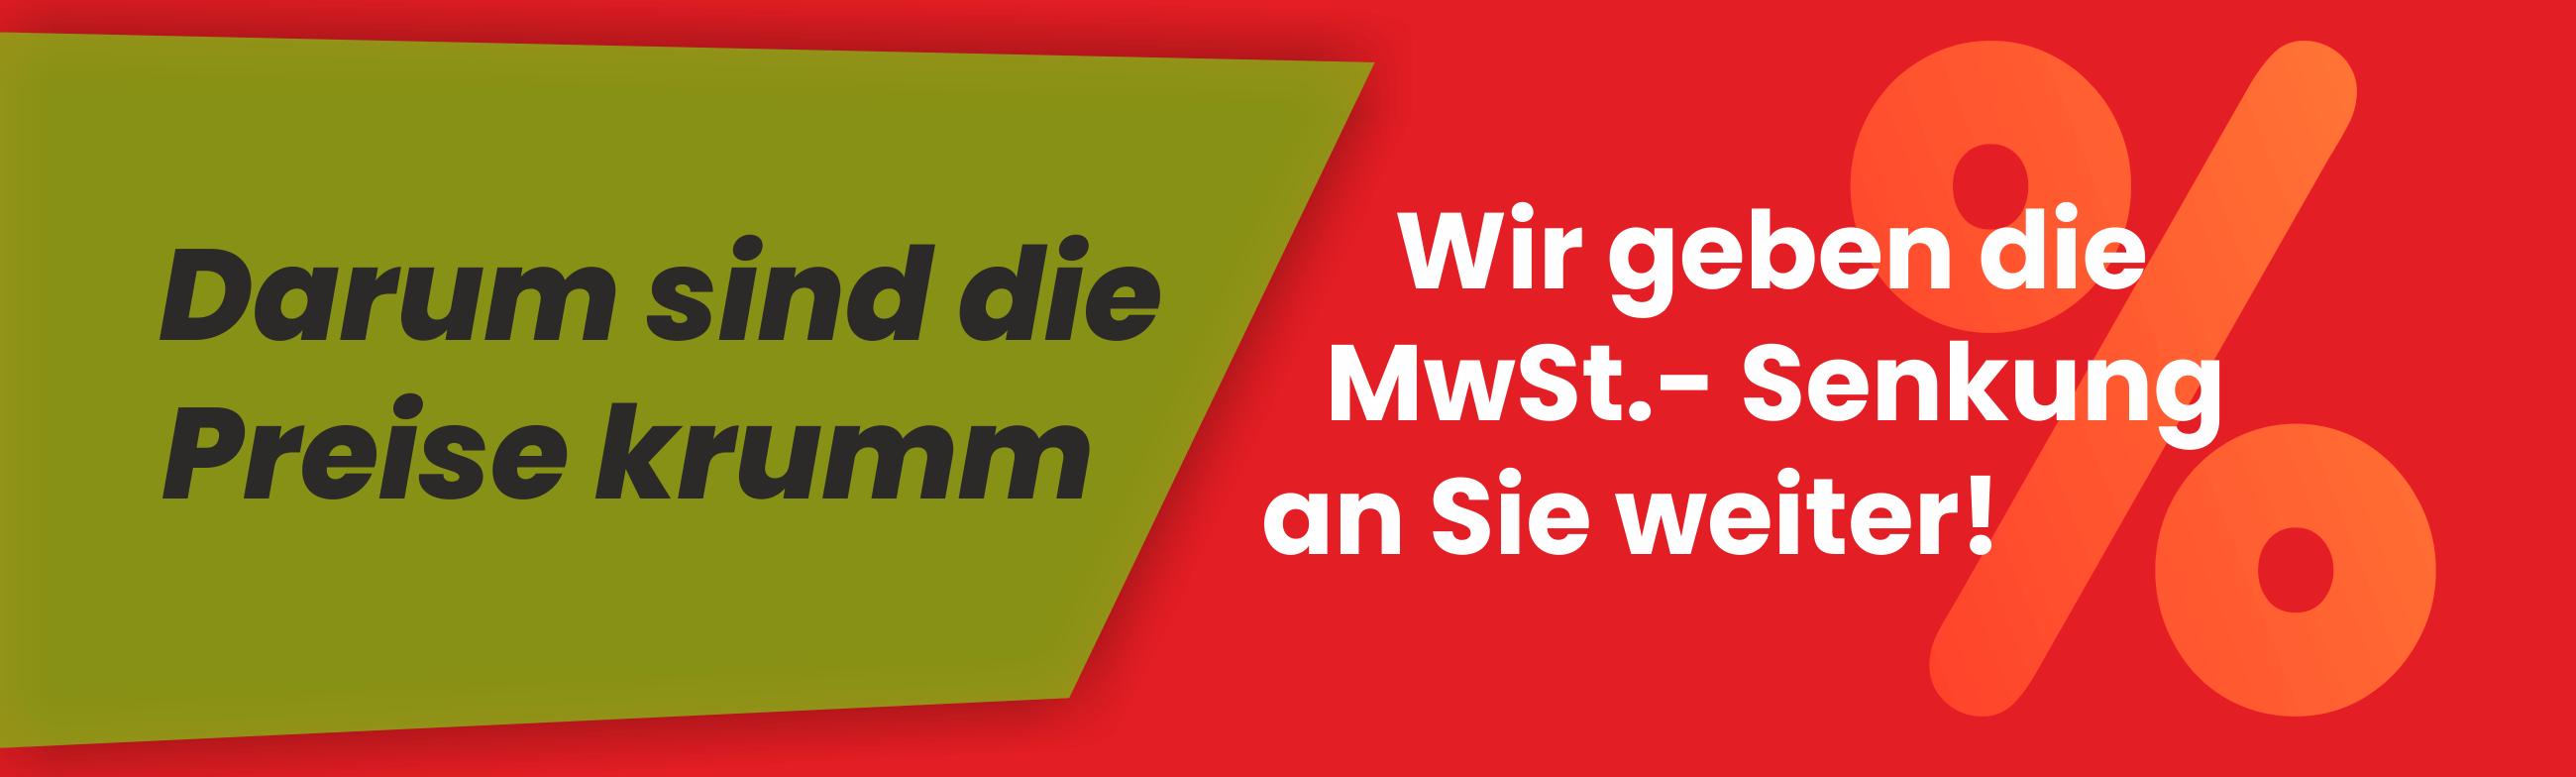 Banner MwSt